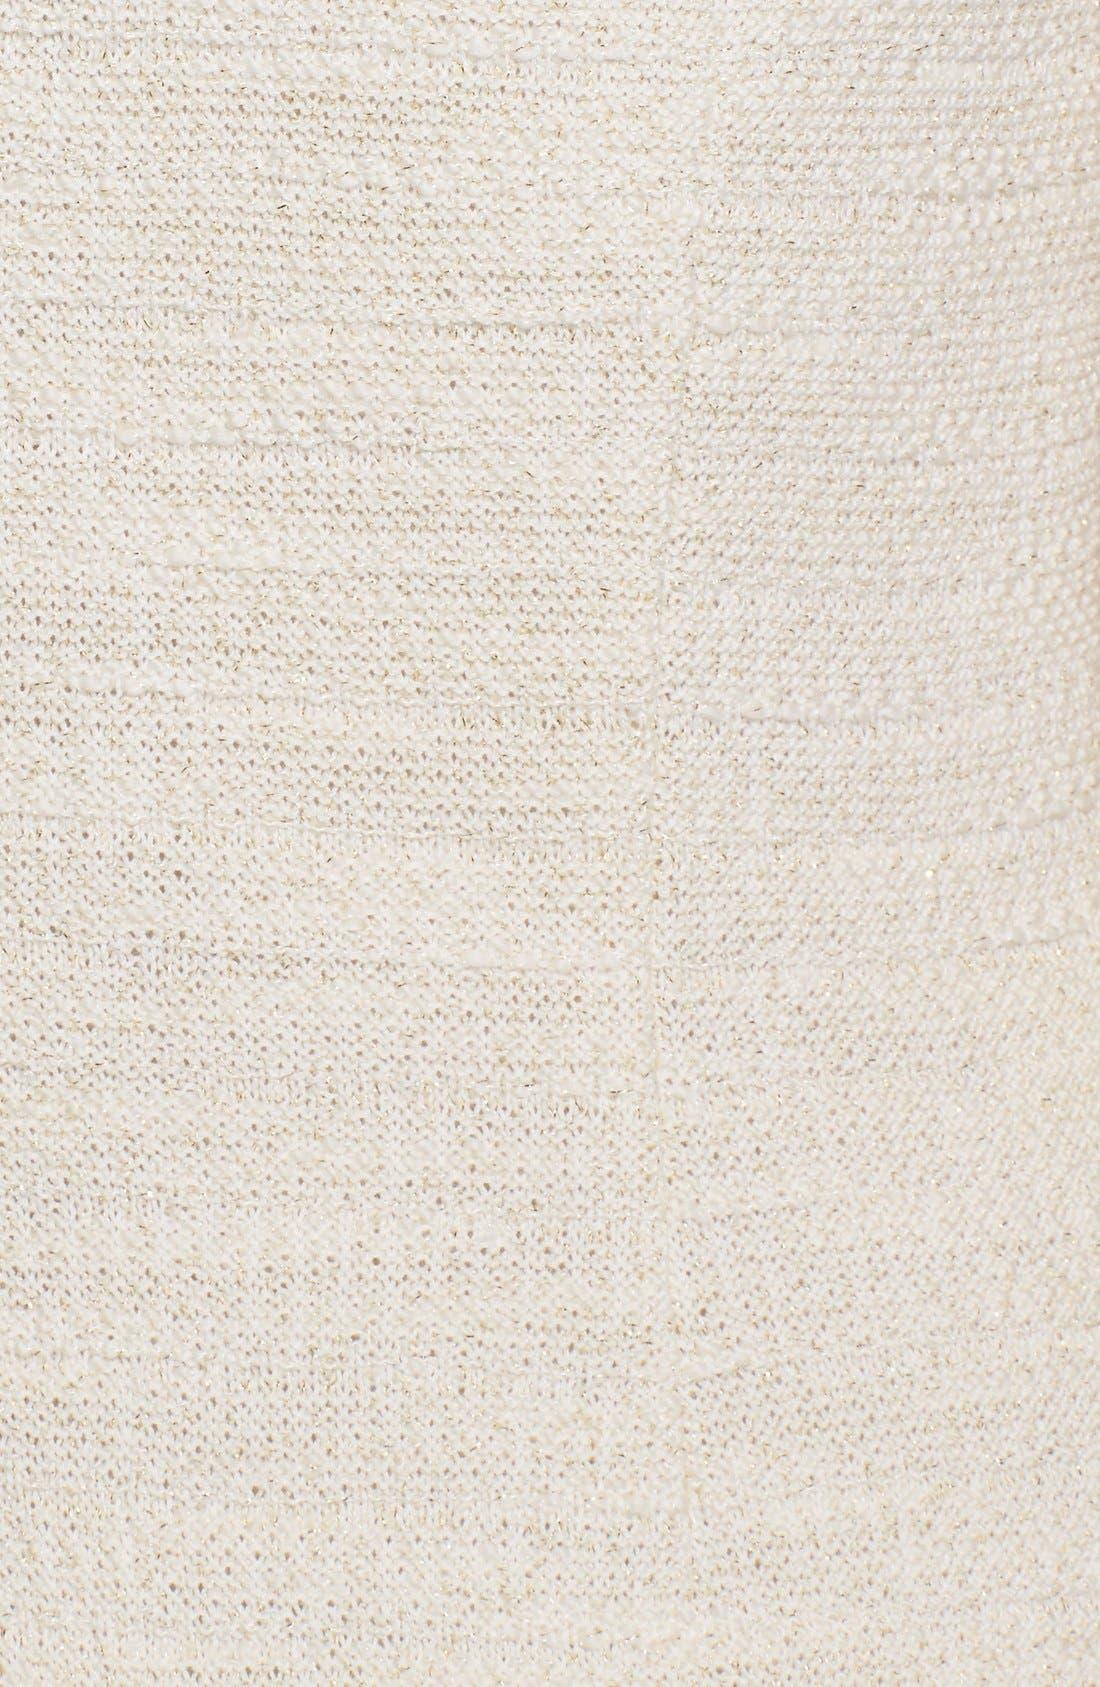 Alternate Image 3  - St. John Collection Sparkle Shantung Knit Dress